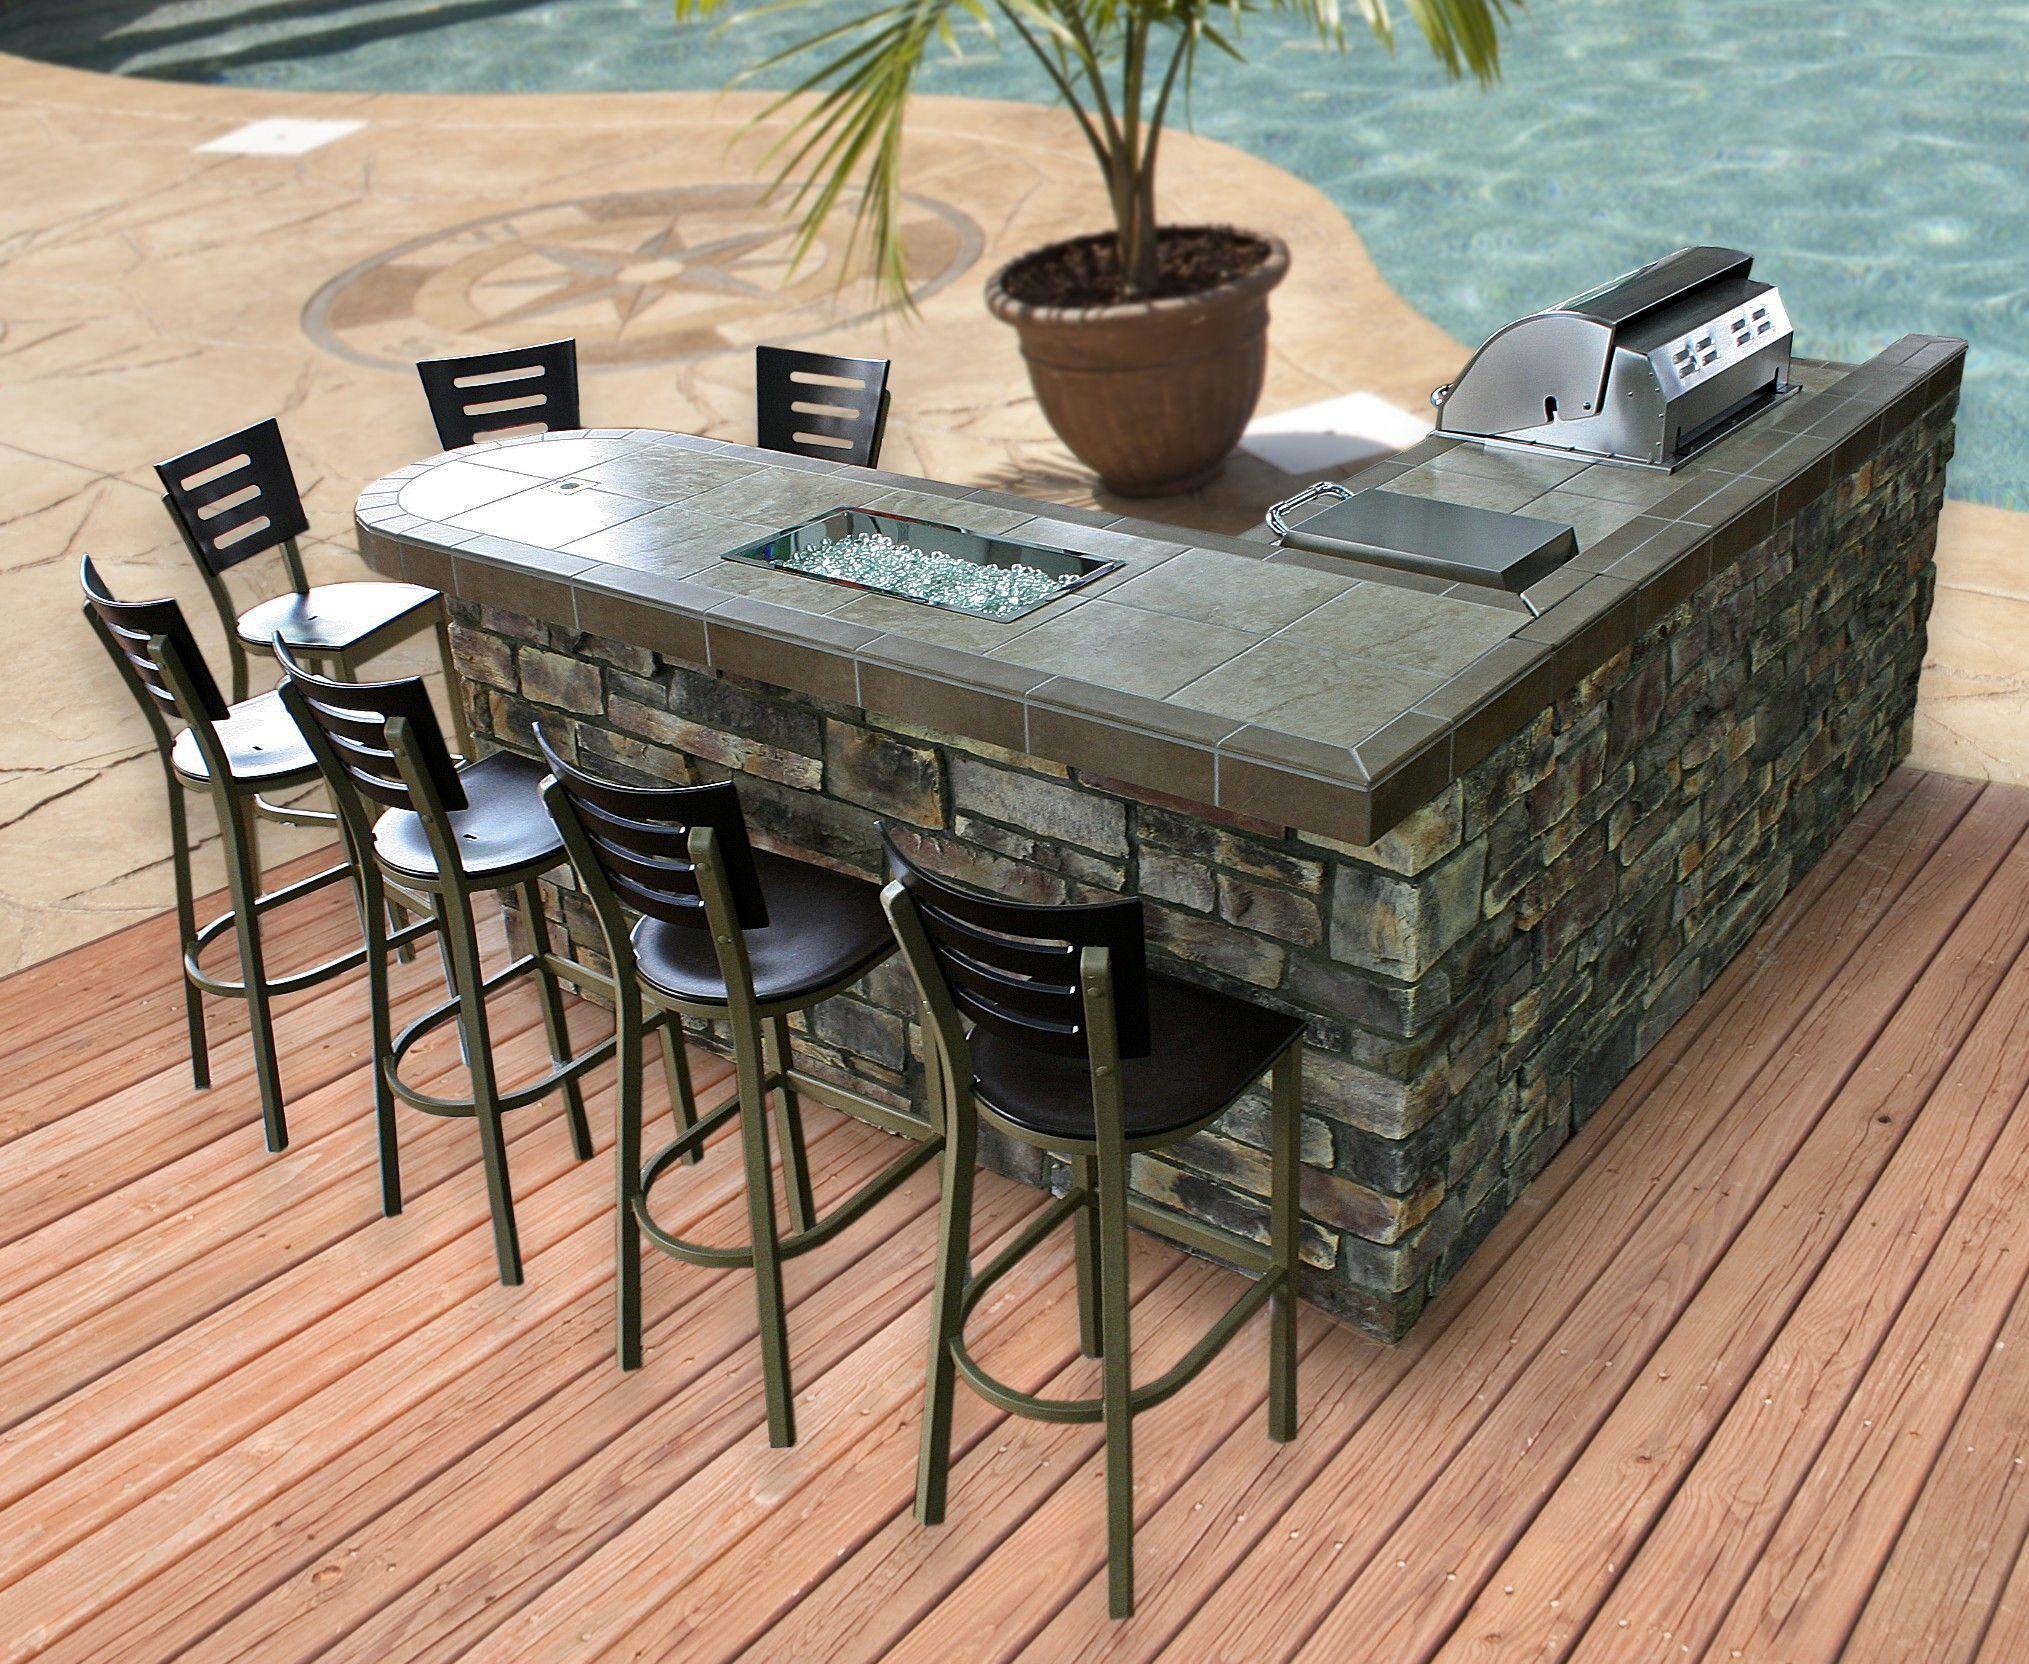 Modular Outdoor Kitchen Frames How To Design Your Perfect Outdoor Kitchen Outdoor Kitchen Design